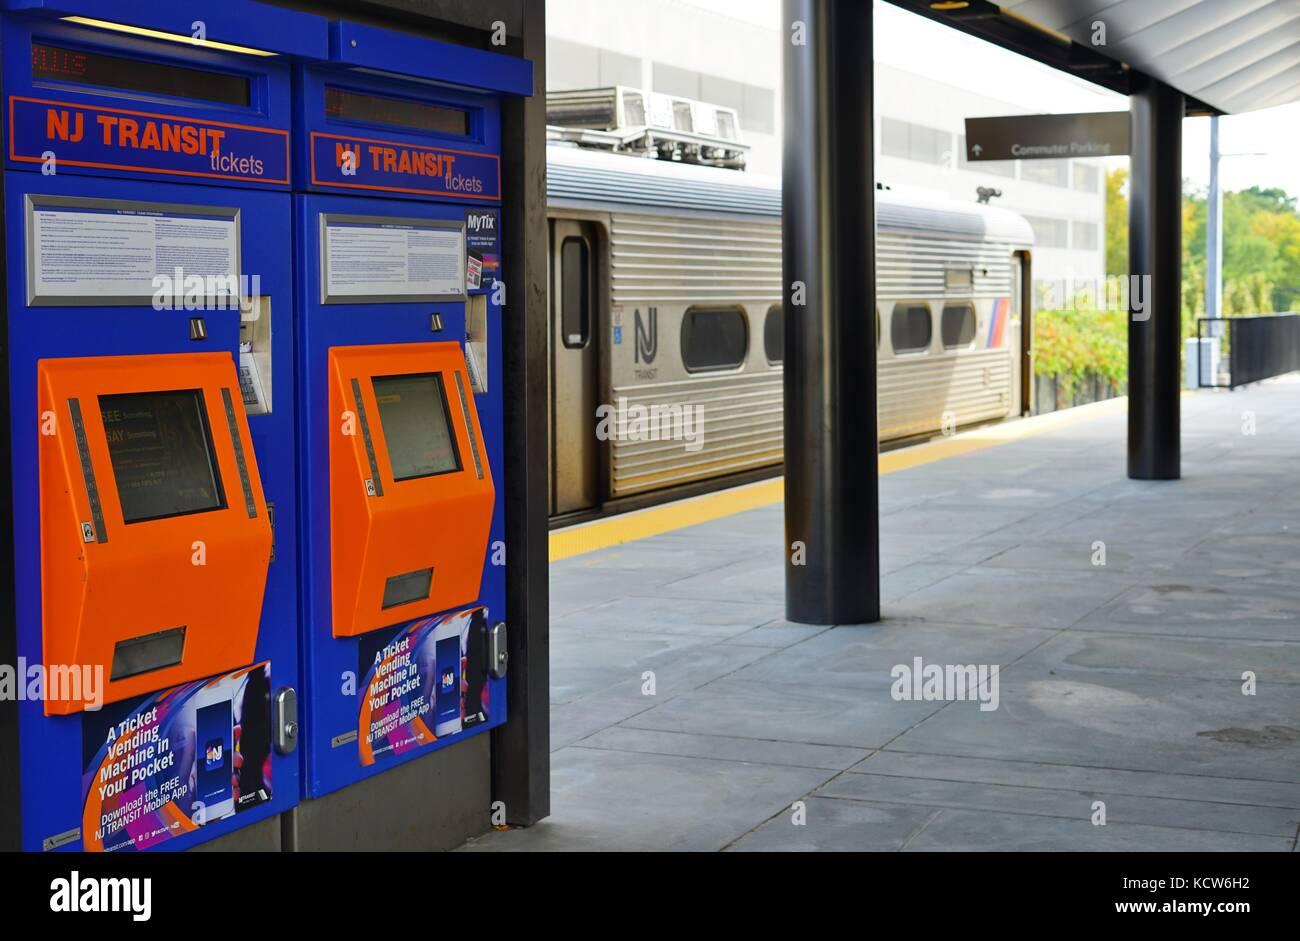 Nj Transit Stock Photos & Nj Transit Stock Images - Alamy